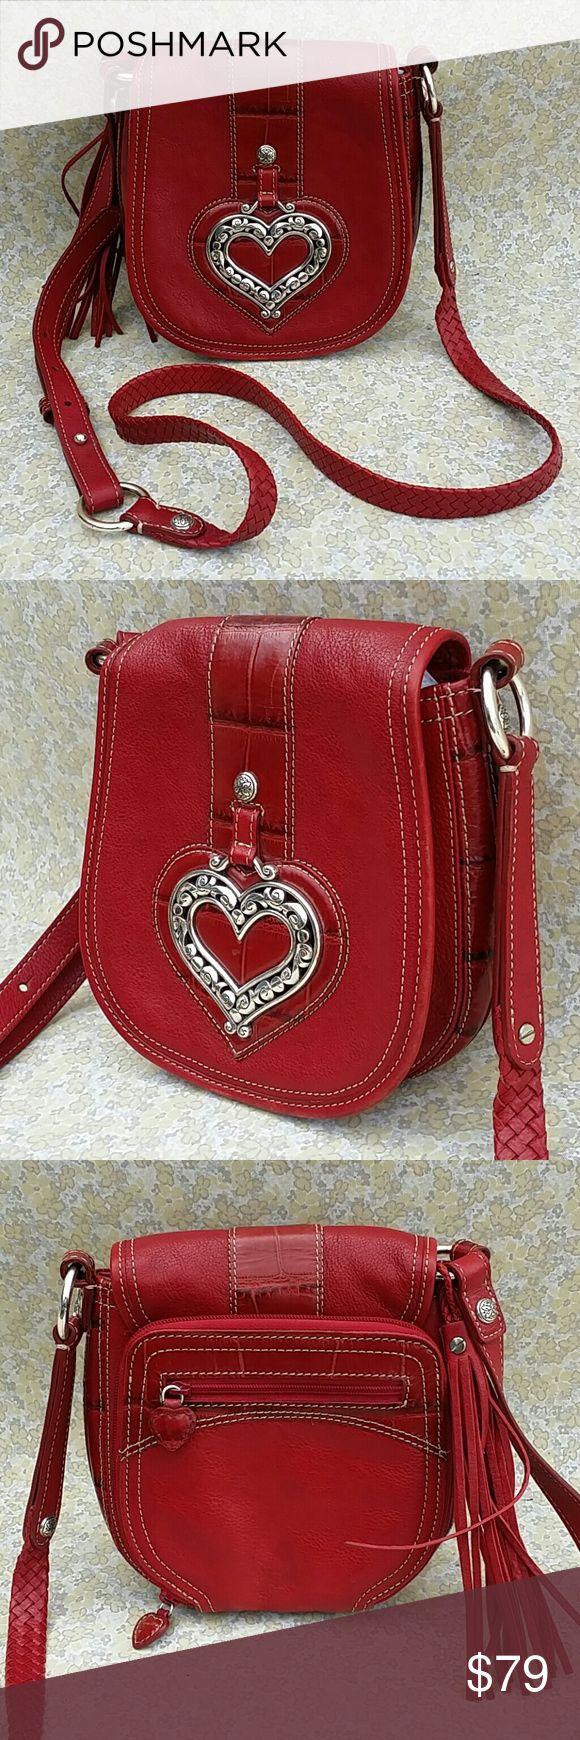 SALE Brighton Red Leather Crossbody Handbag Brighton Red Leather Crossbody Handbag Brighton Bags Crossbody Bags